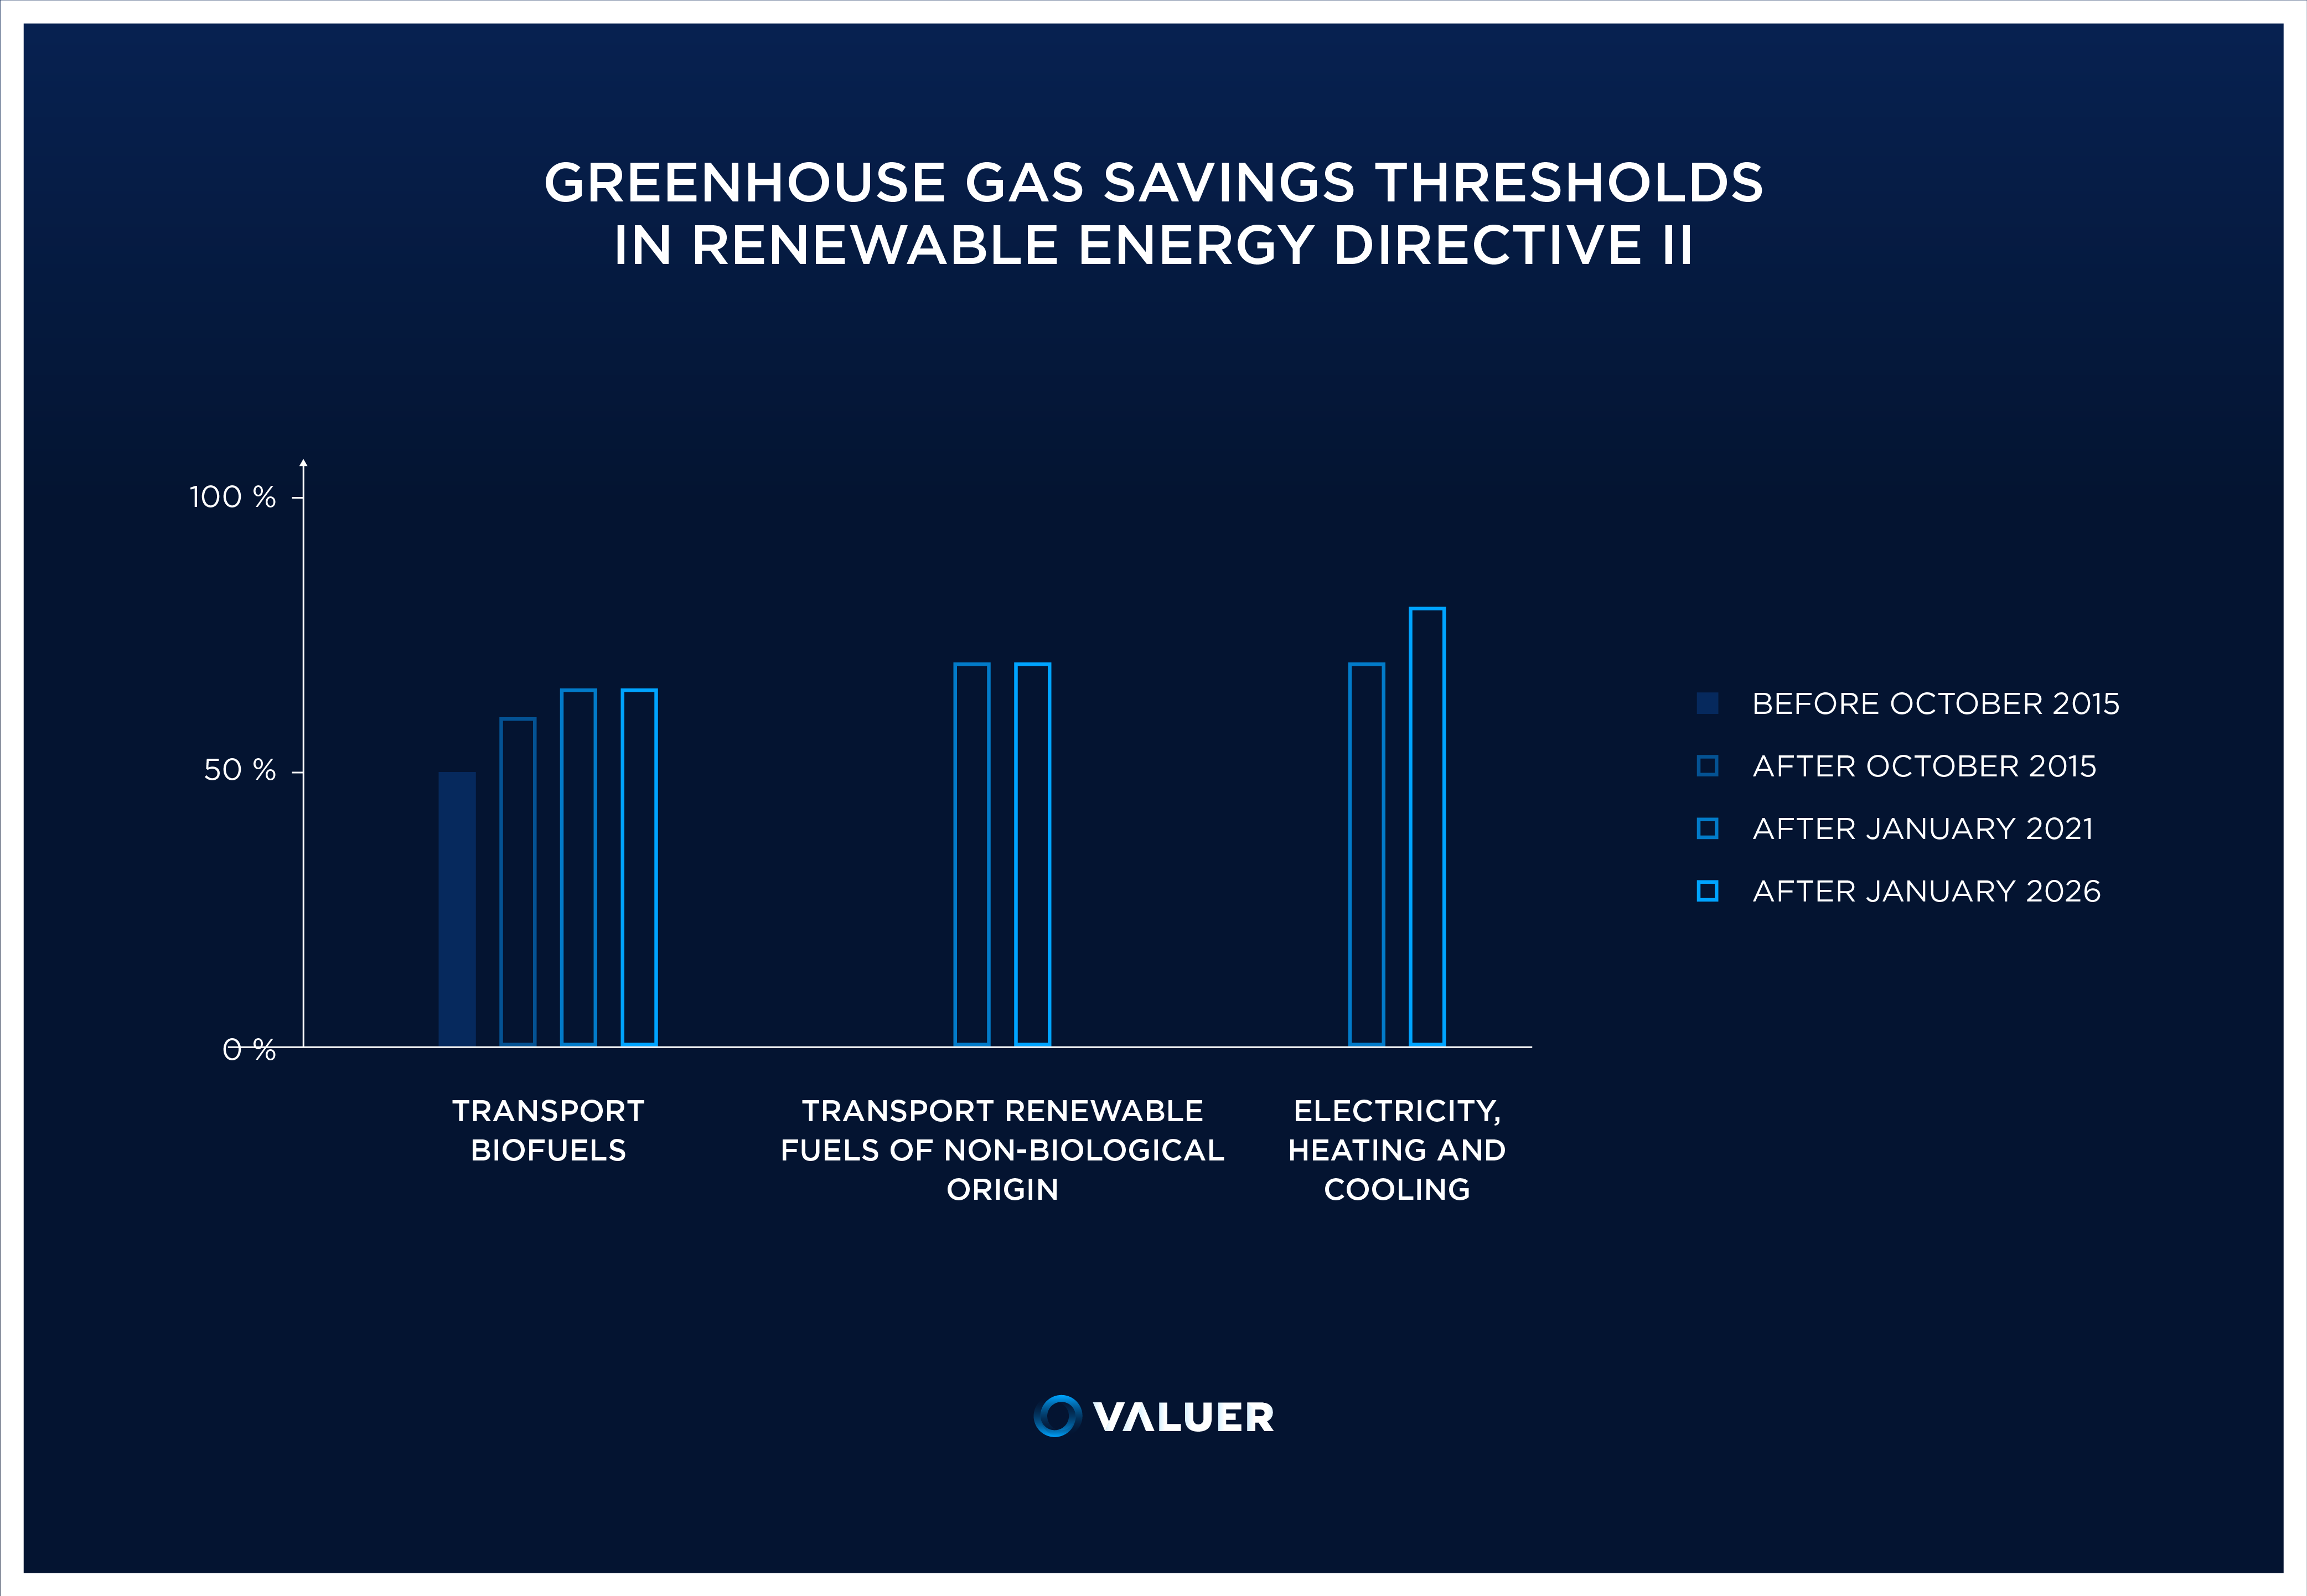 ENERGY_GREENHOUSE GAS SAVINGS NAVY